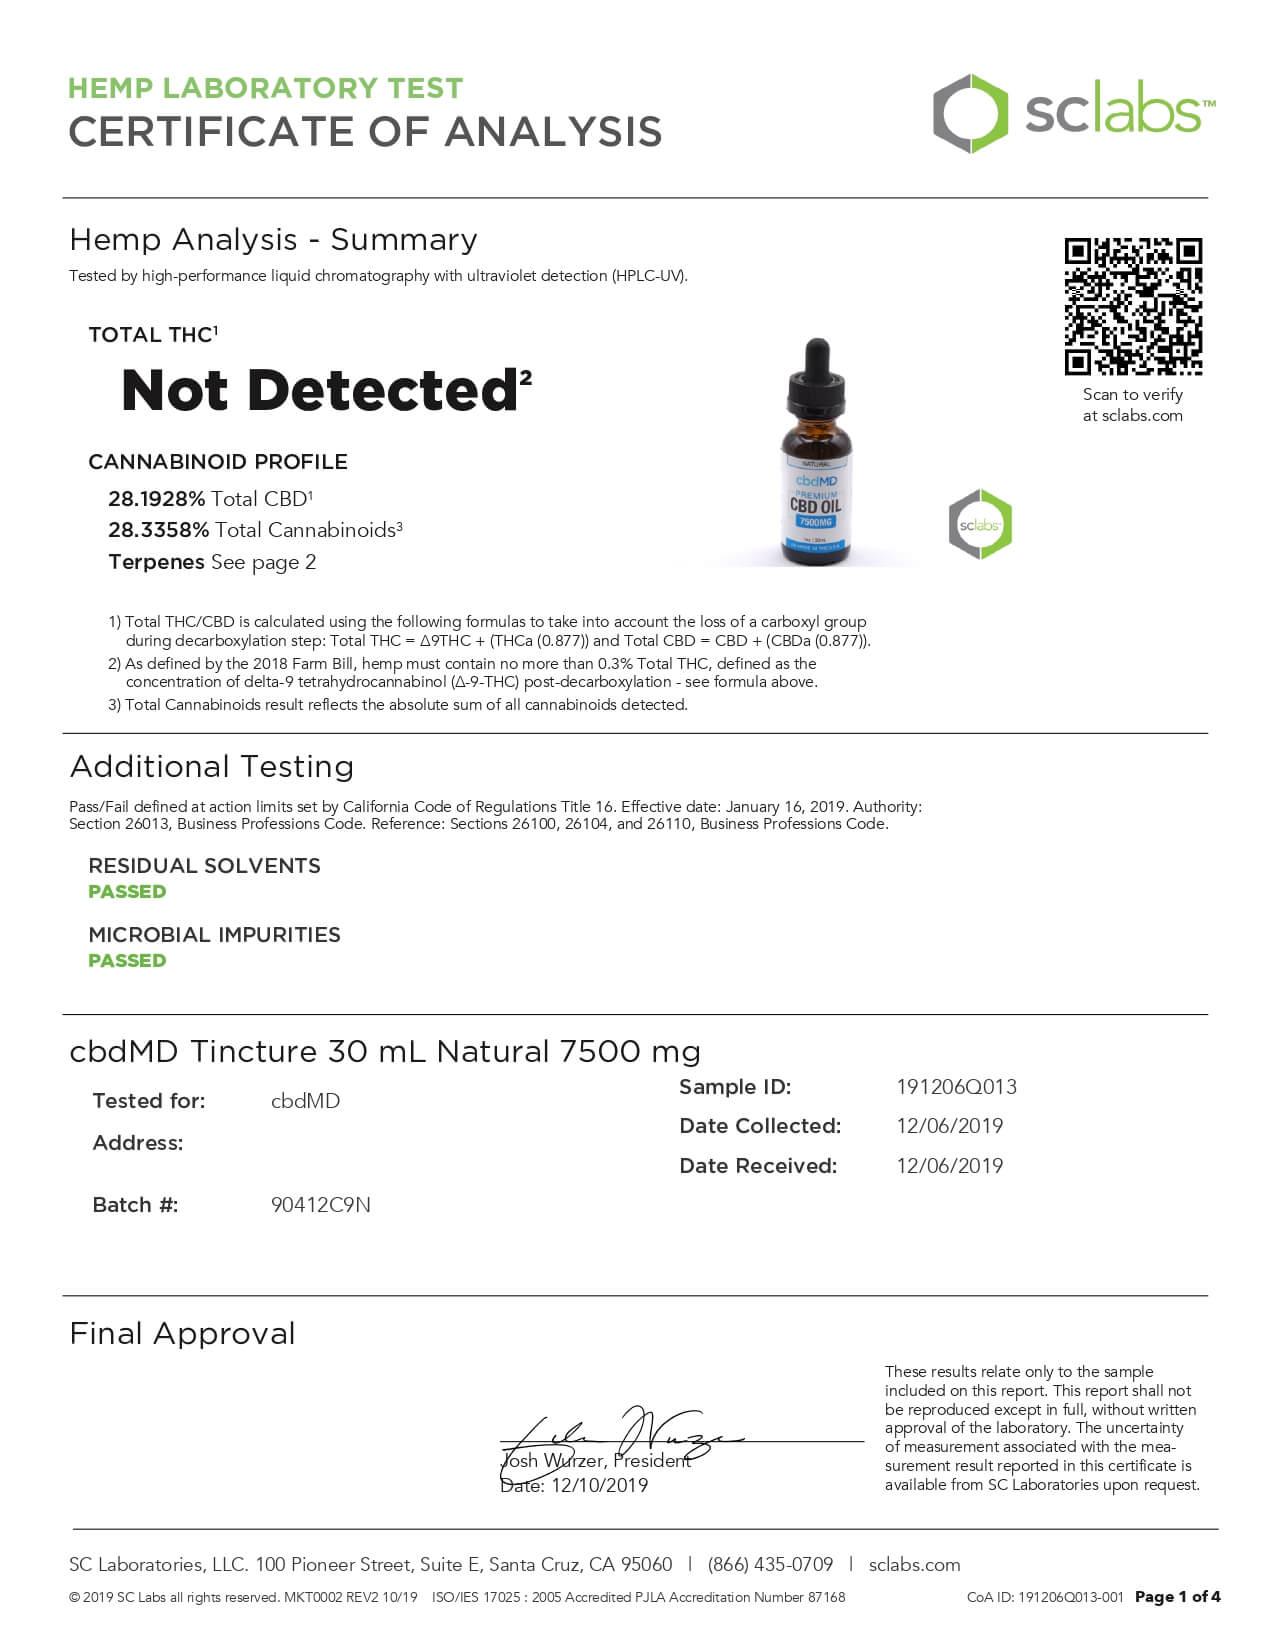 cbdMD CBD Tincture Broad Specrum Natural 30ml 7500mg Lab Report